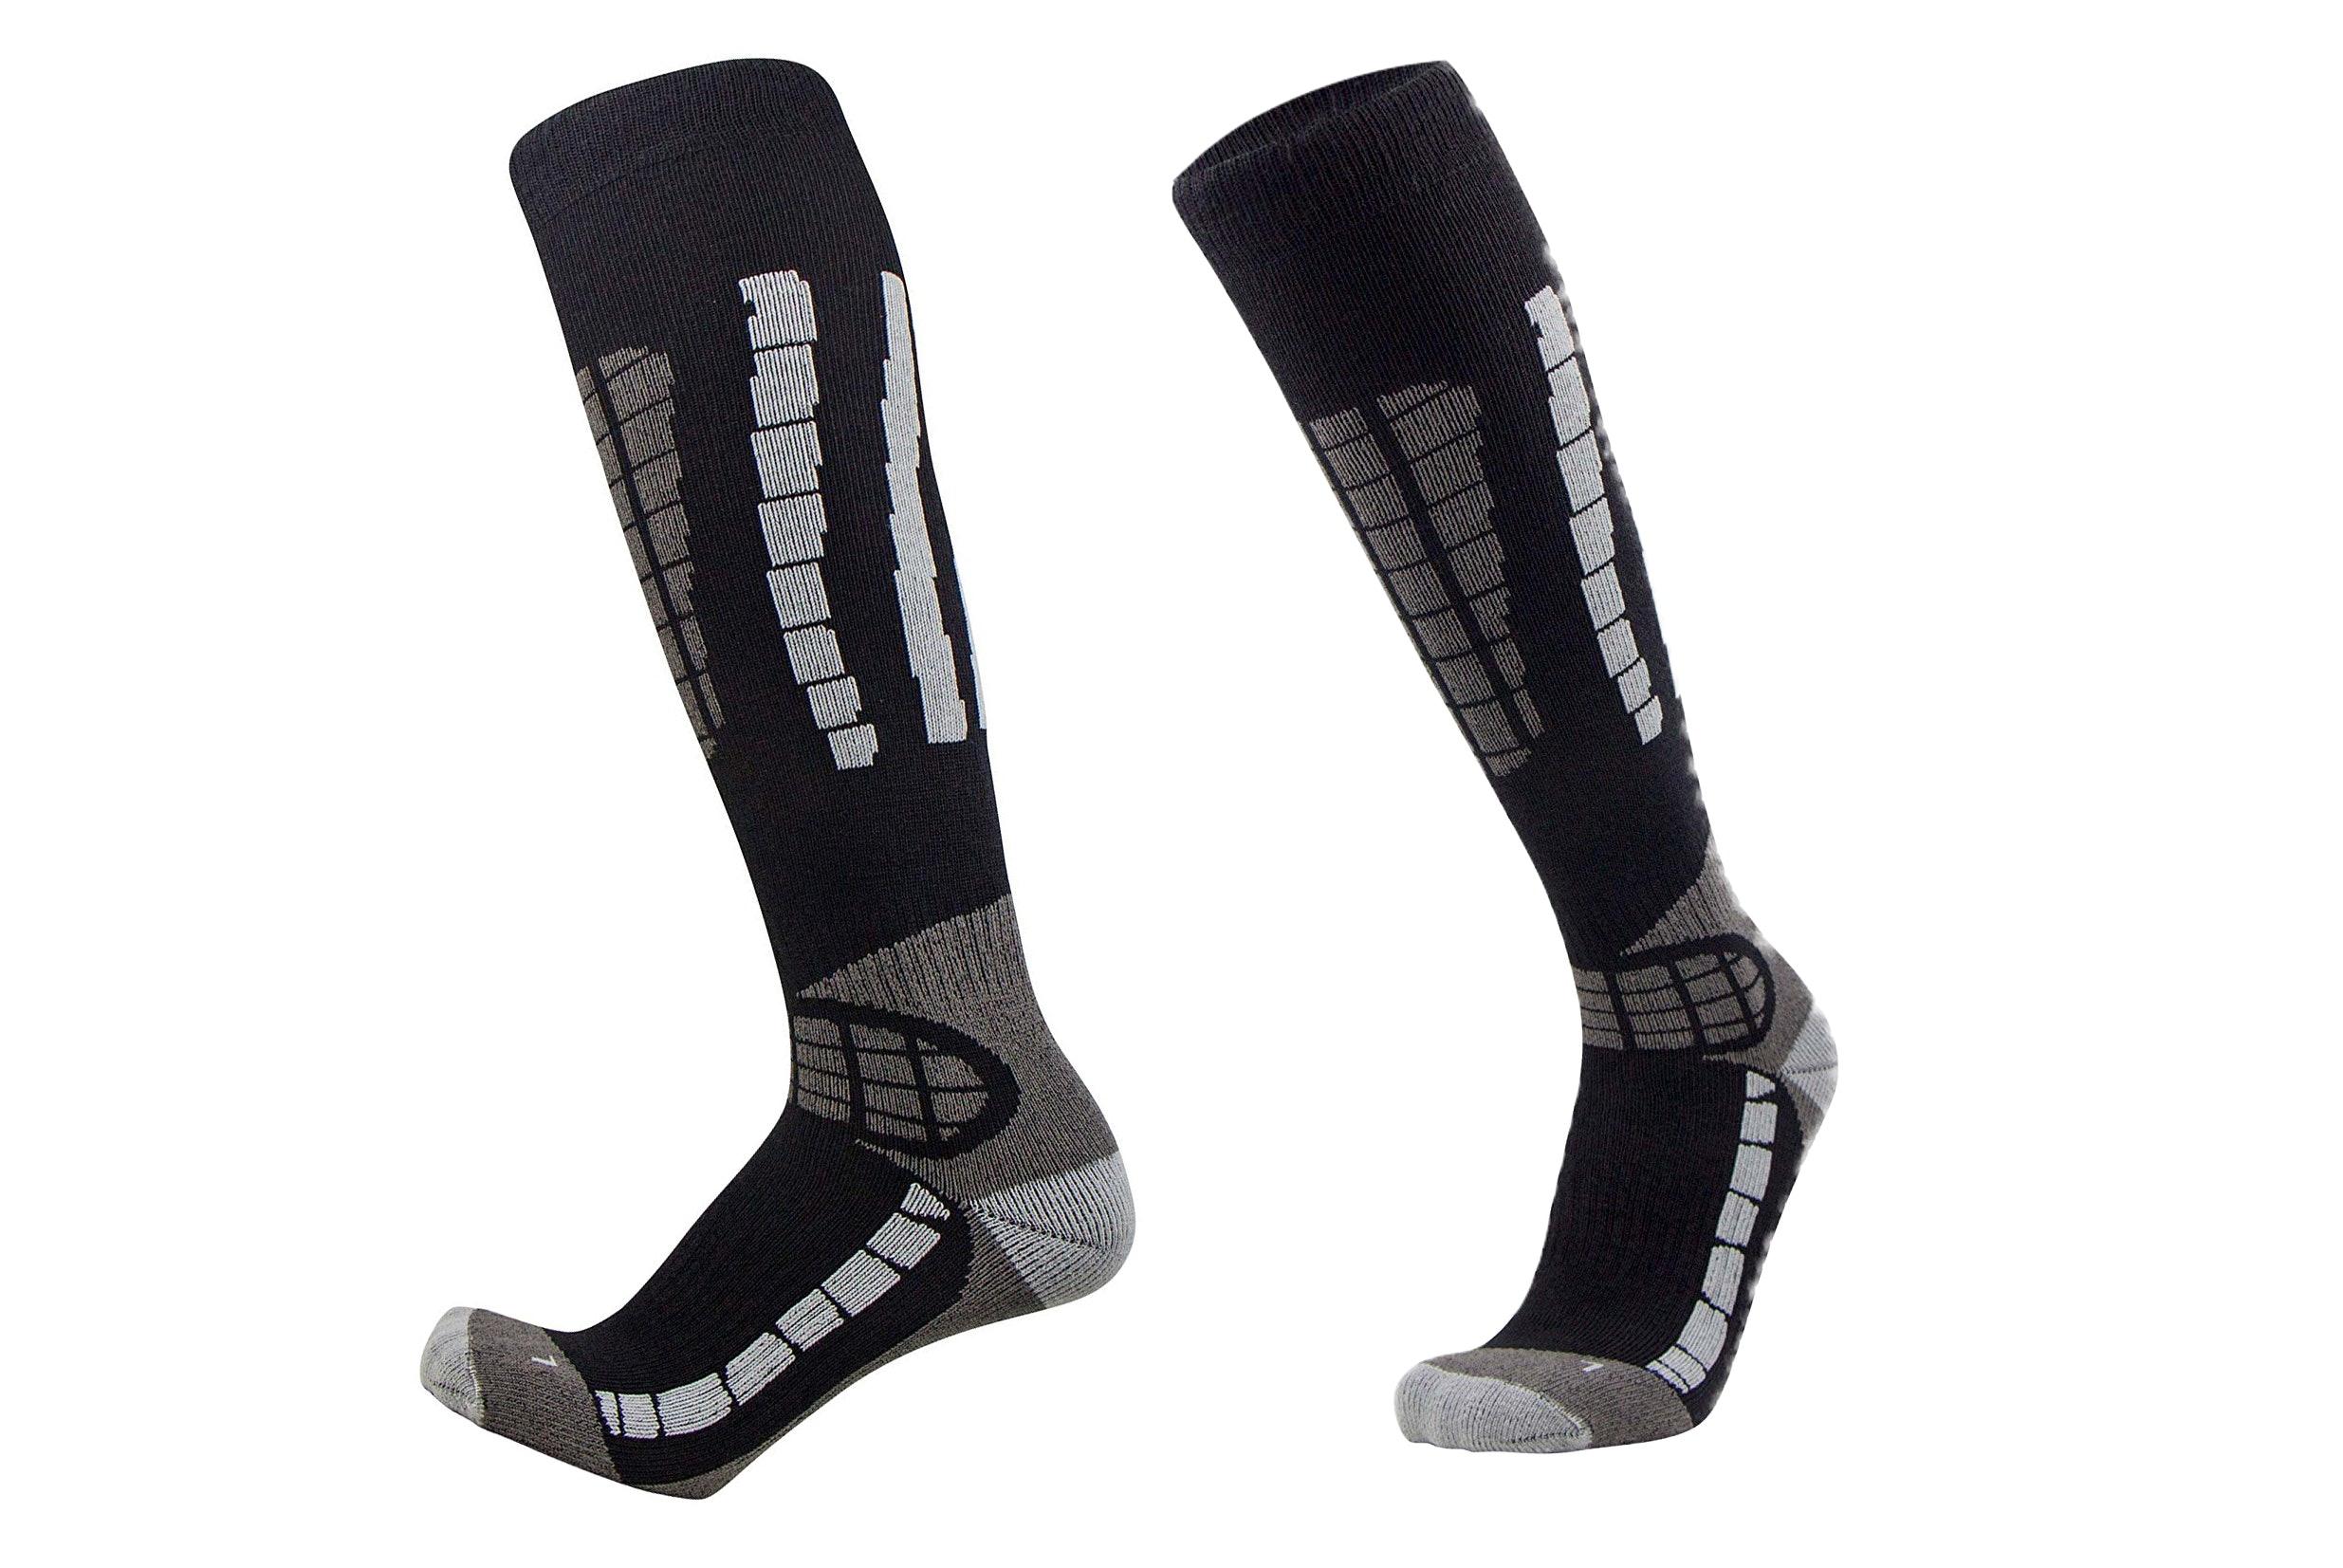 anklet run supreme comforter wiggle socks comfort hidden balega hilly monoskin